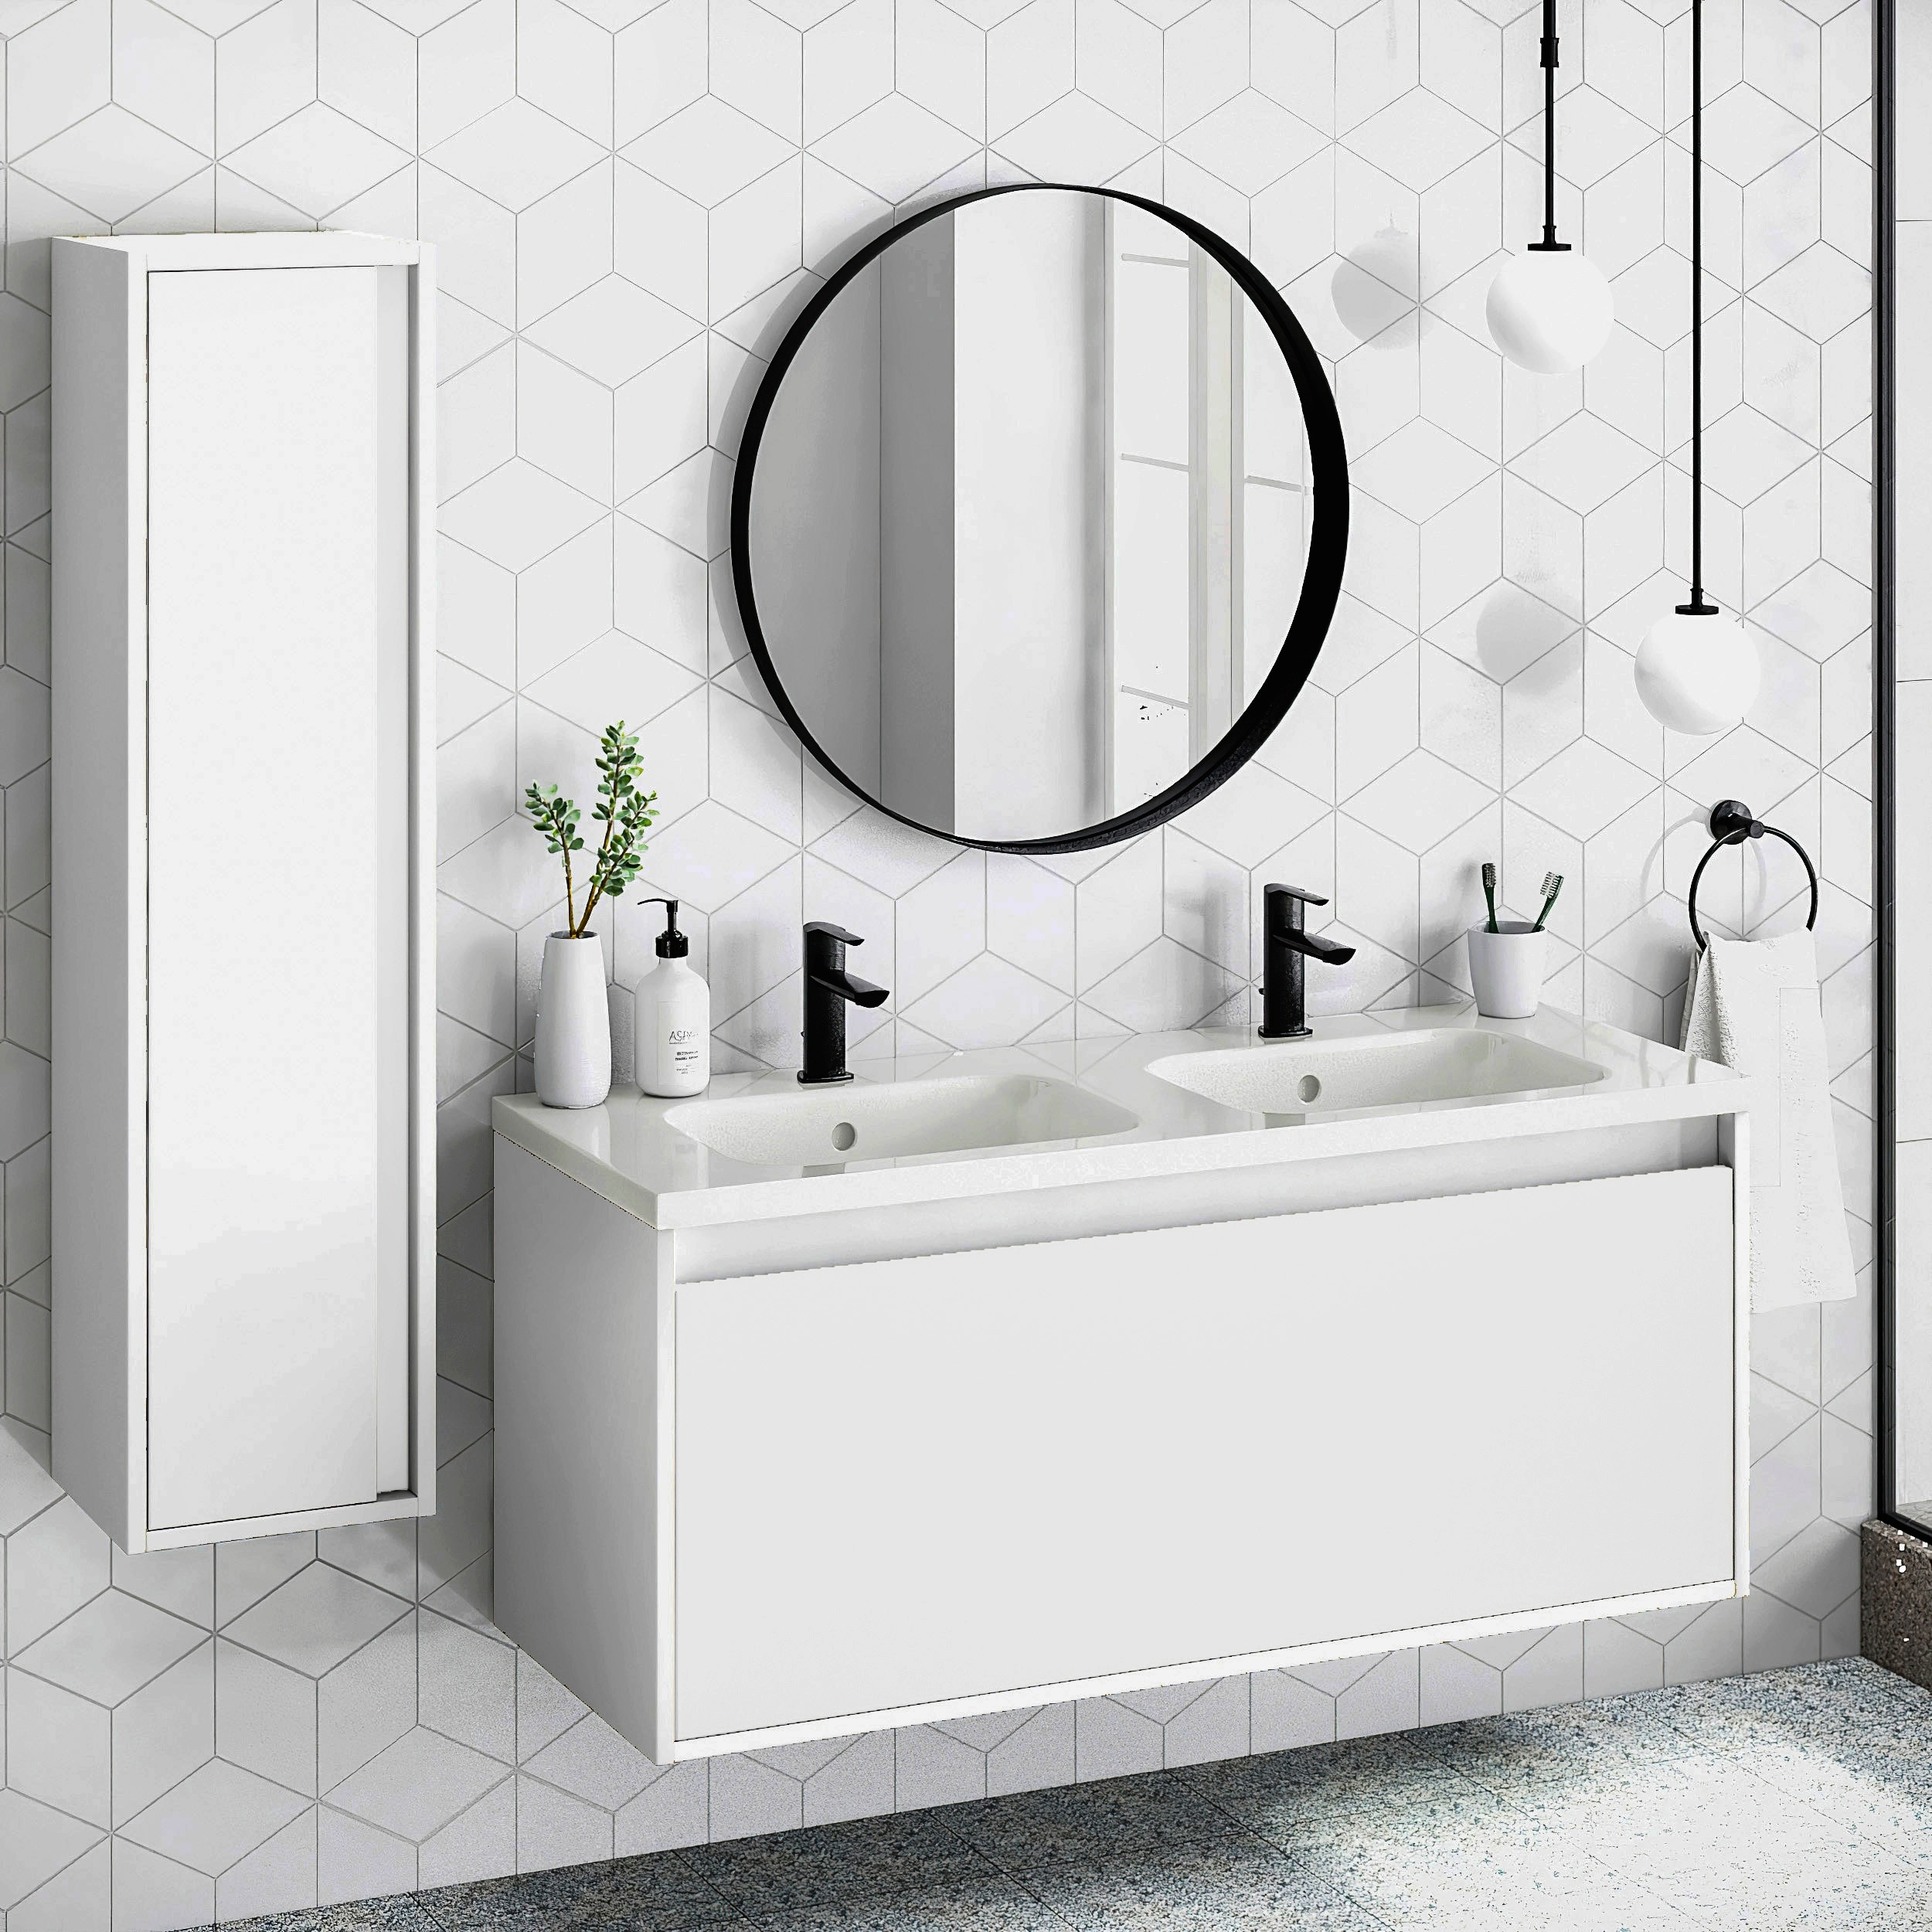 48 Bathroom Vanity Cabinet Ceramic Sink Tribeca W 48 X H 20 X D 18 In Rhd White Overstock 31571509